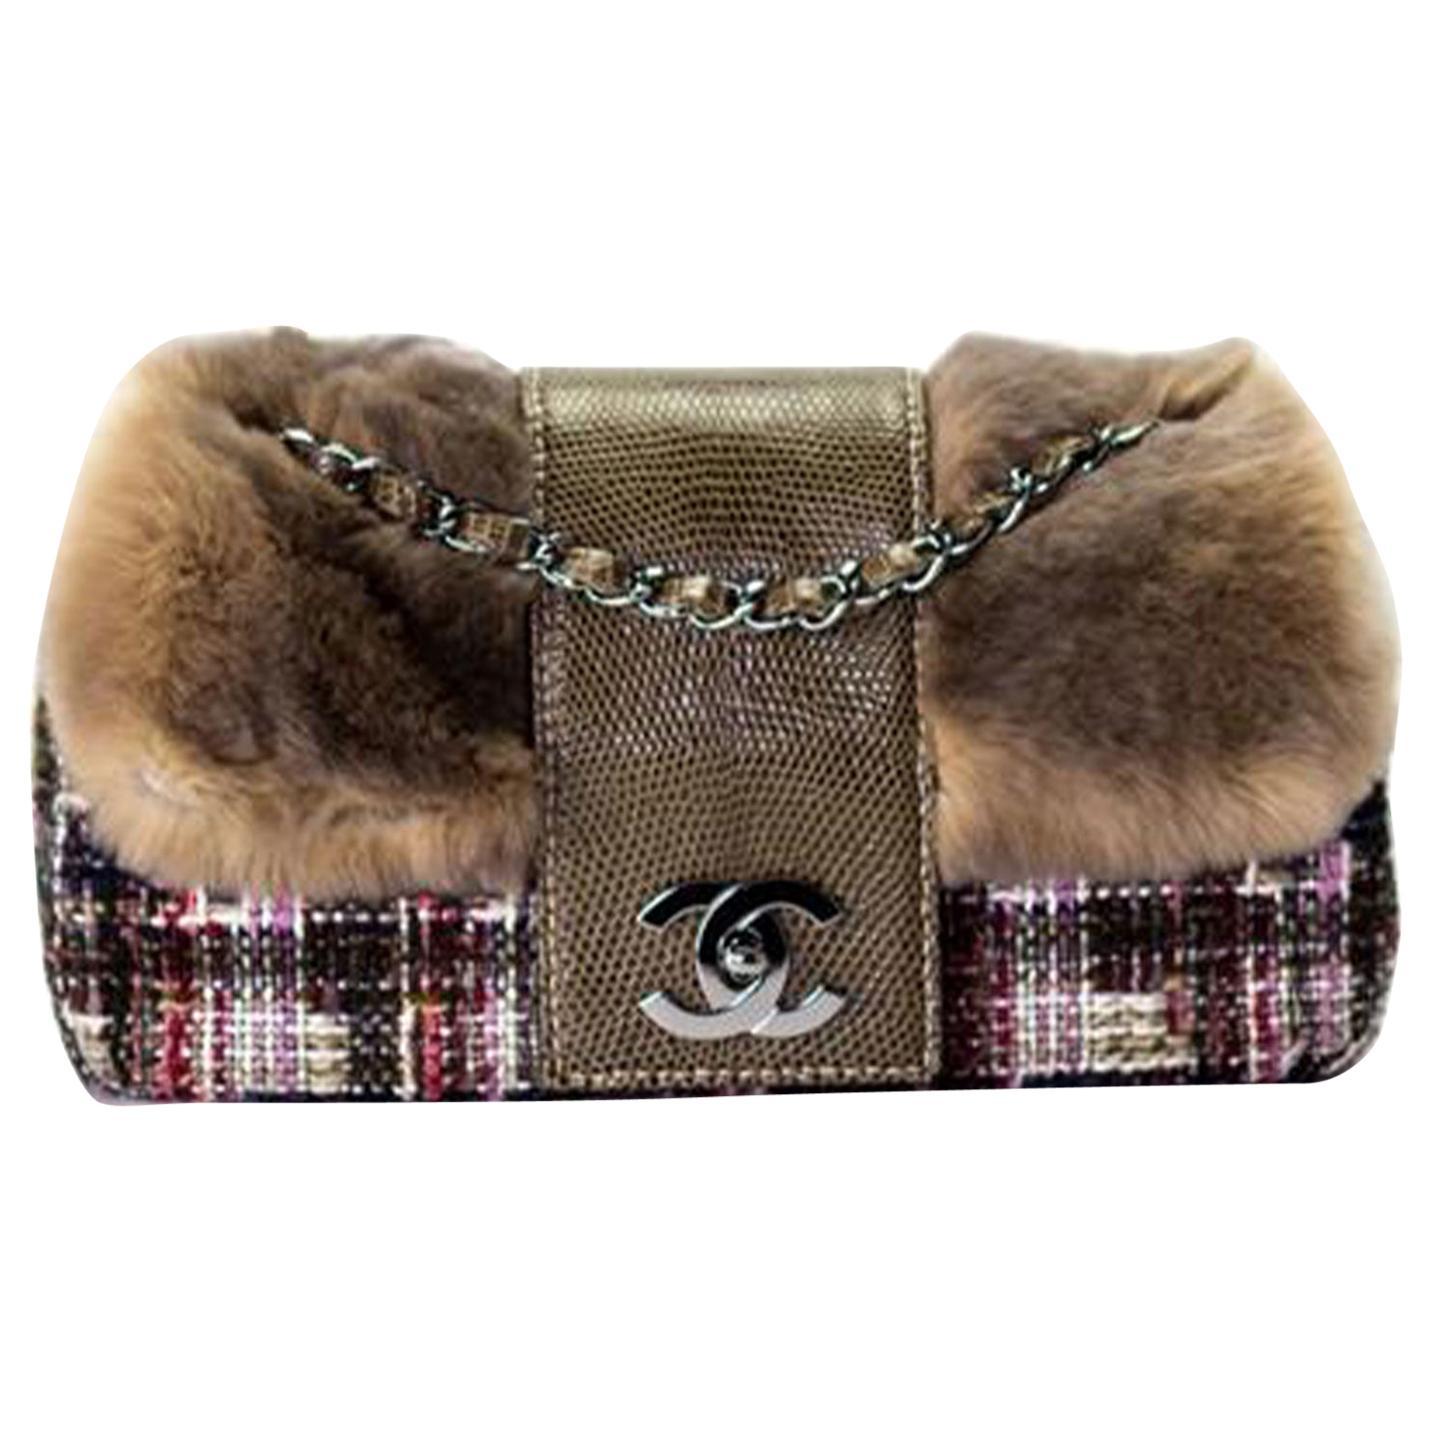 Chanel Classic Flap Rare Limited Edition & Lizard Multi-color Brown Fur Bag